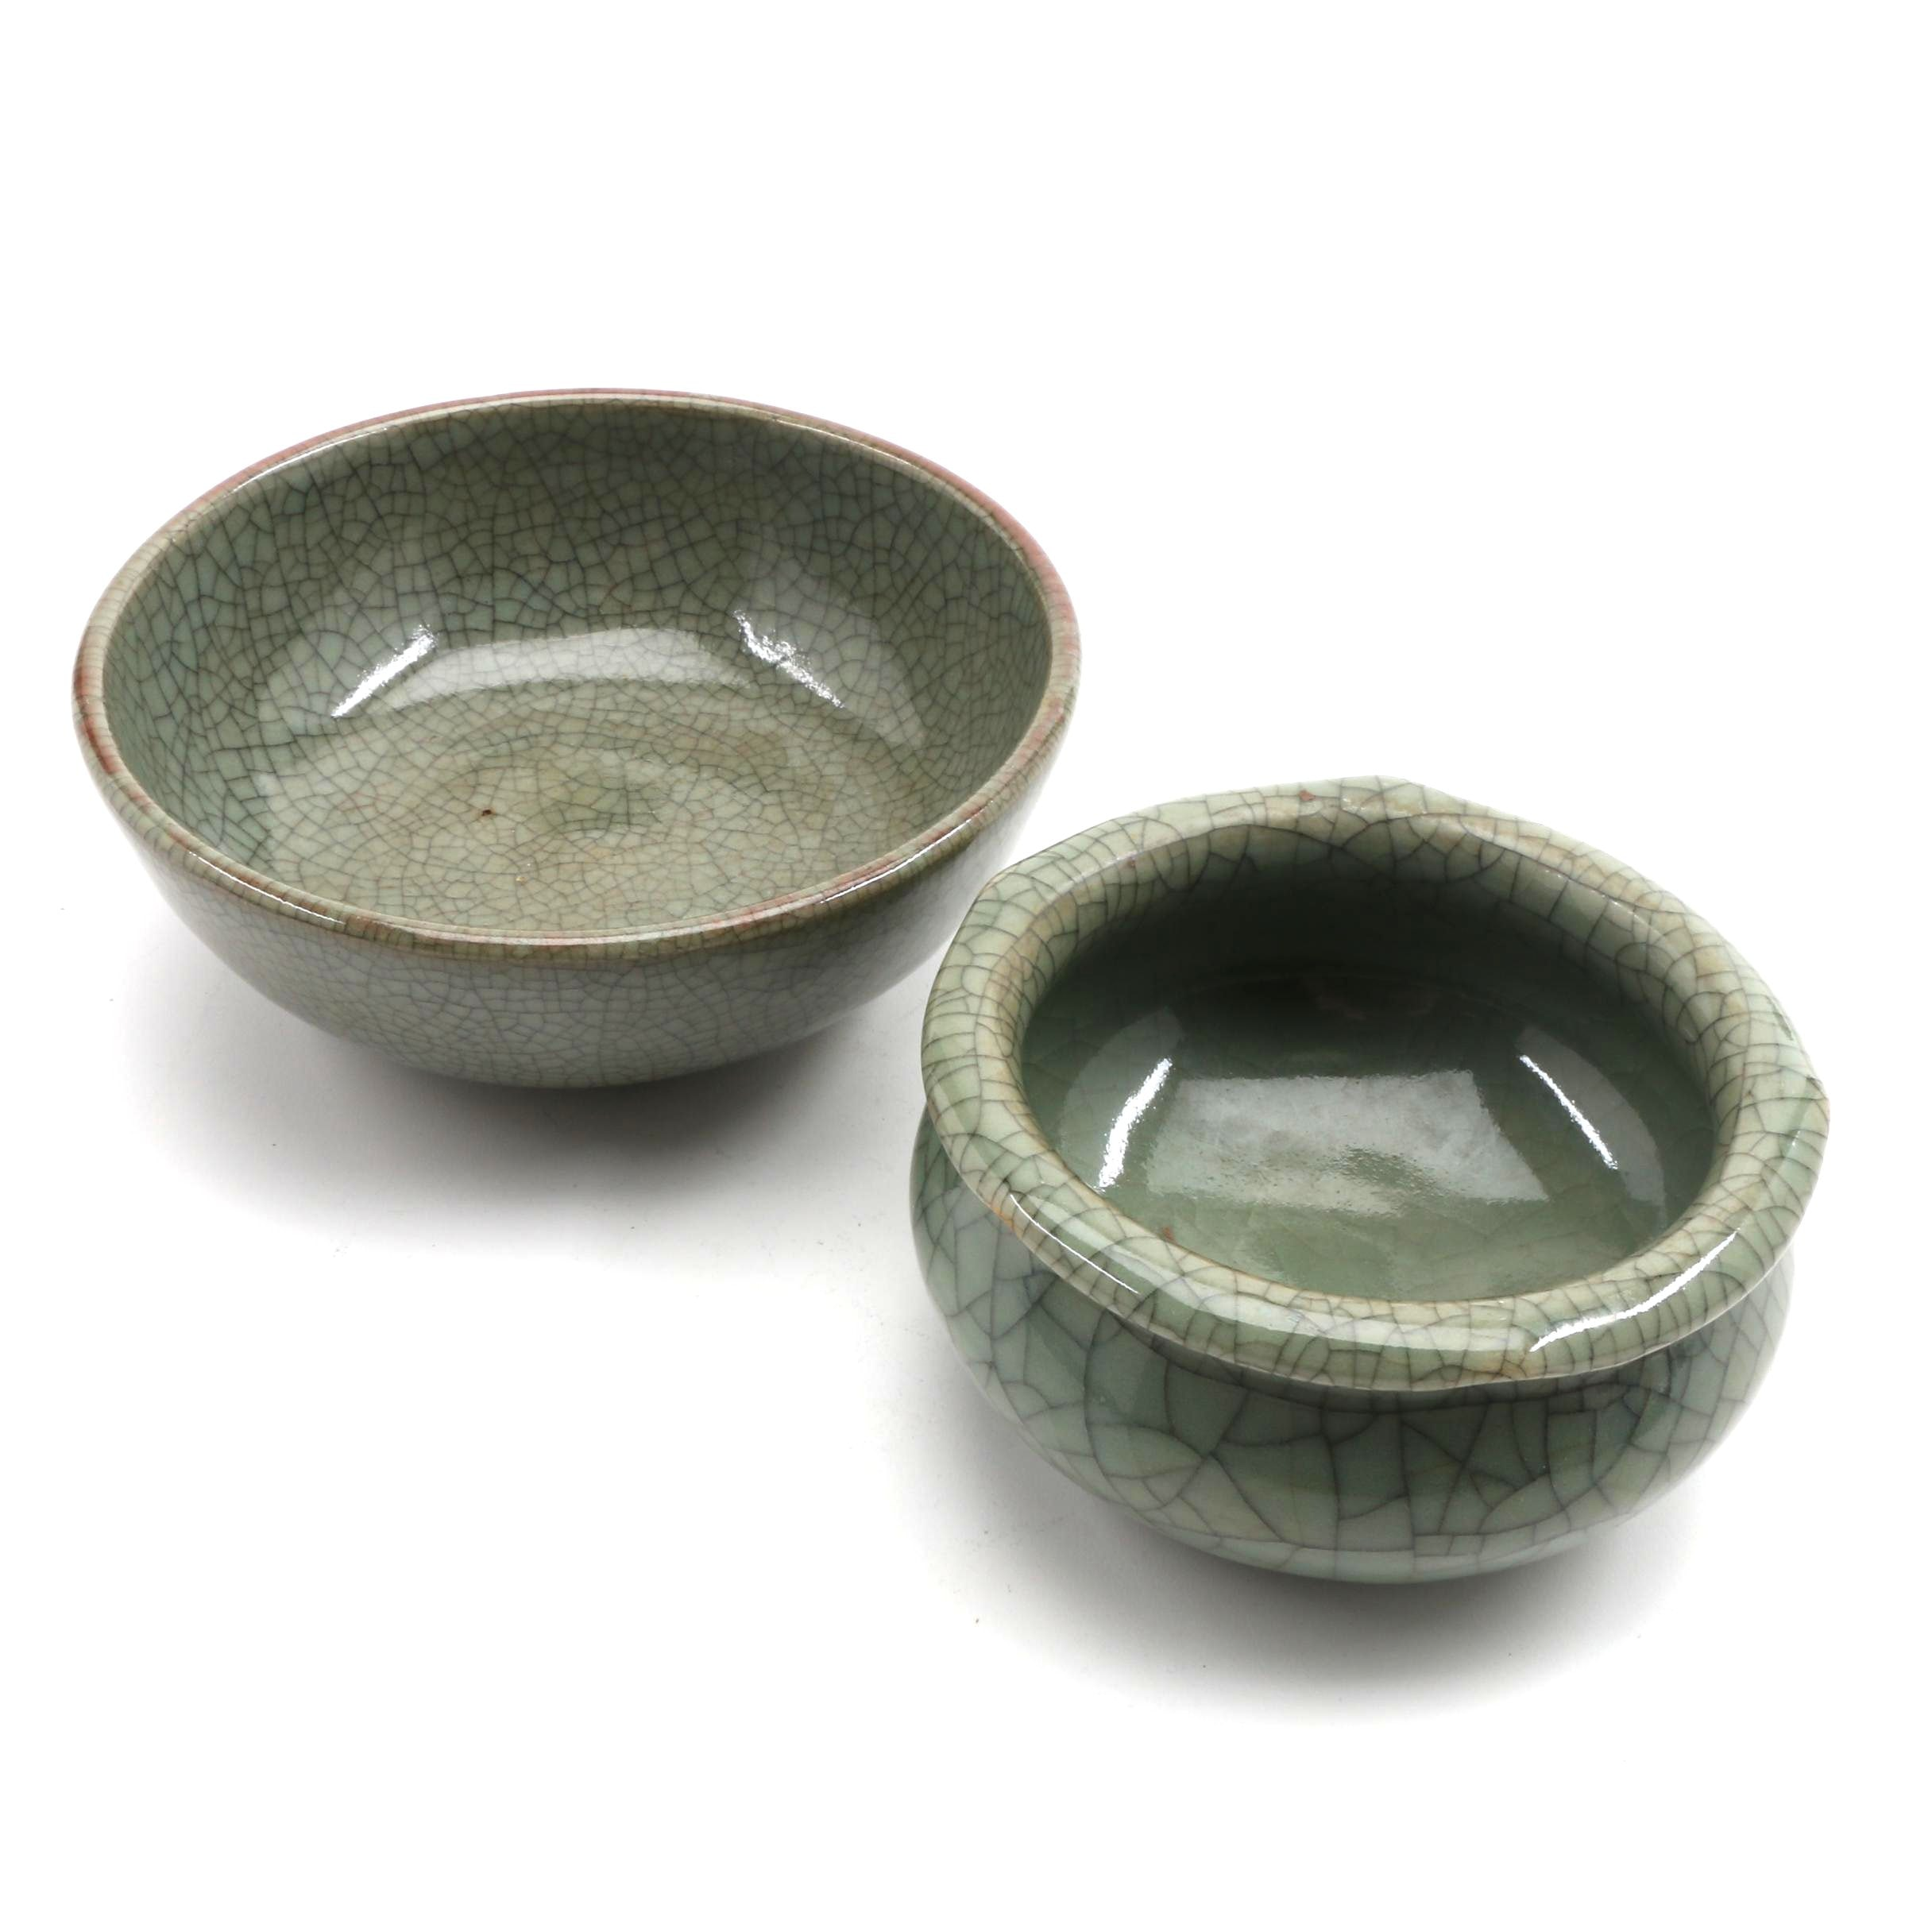 Two Chinese Crackle Glaze Celadon Tea Bowls